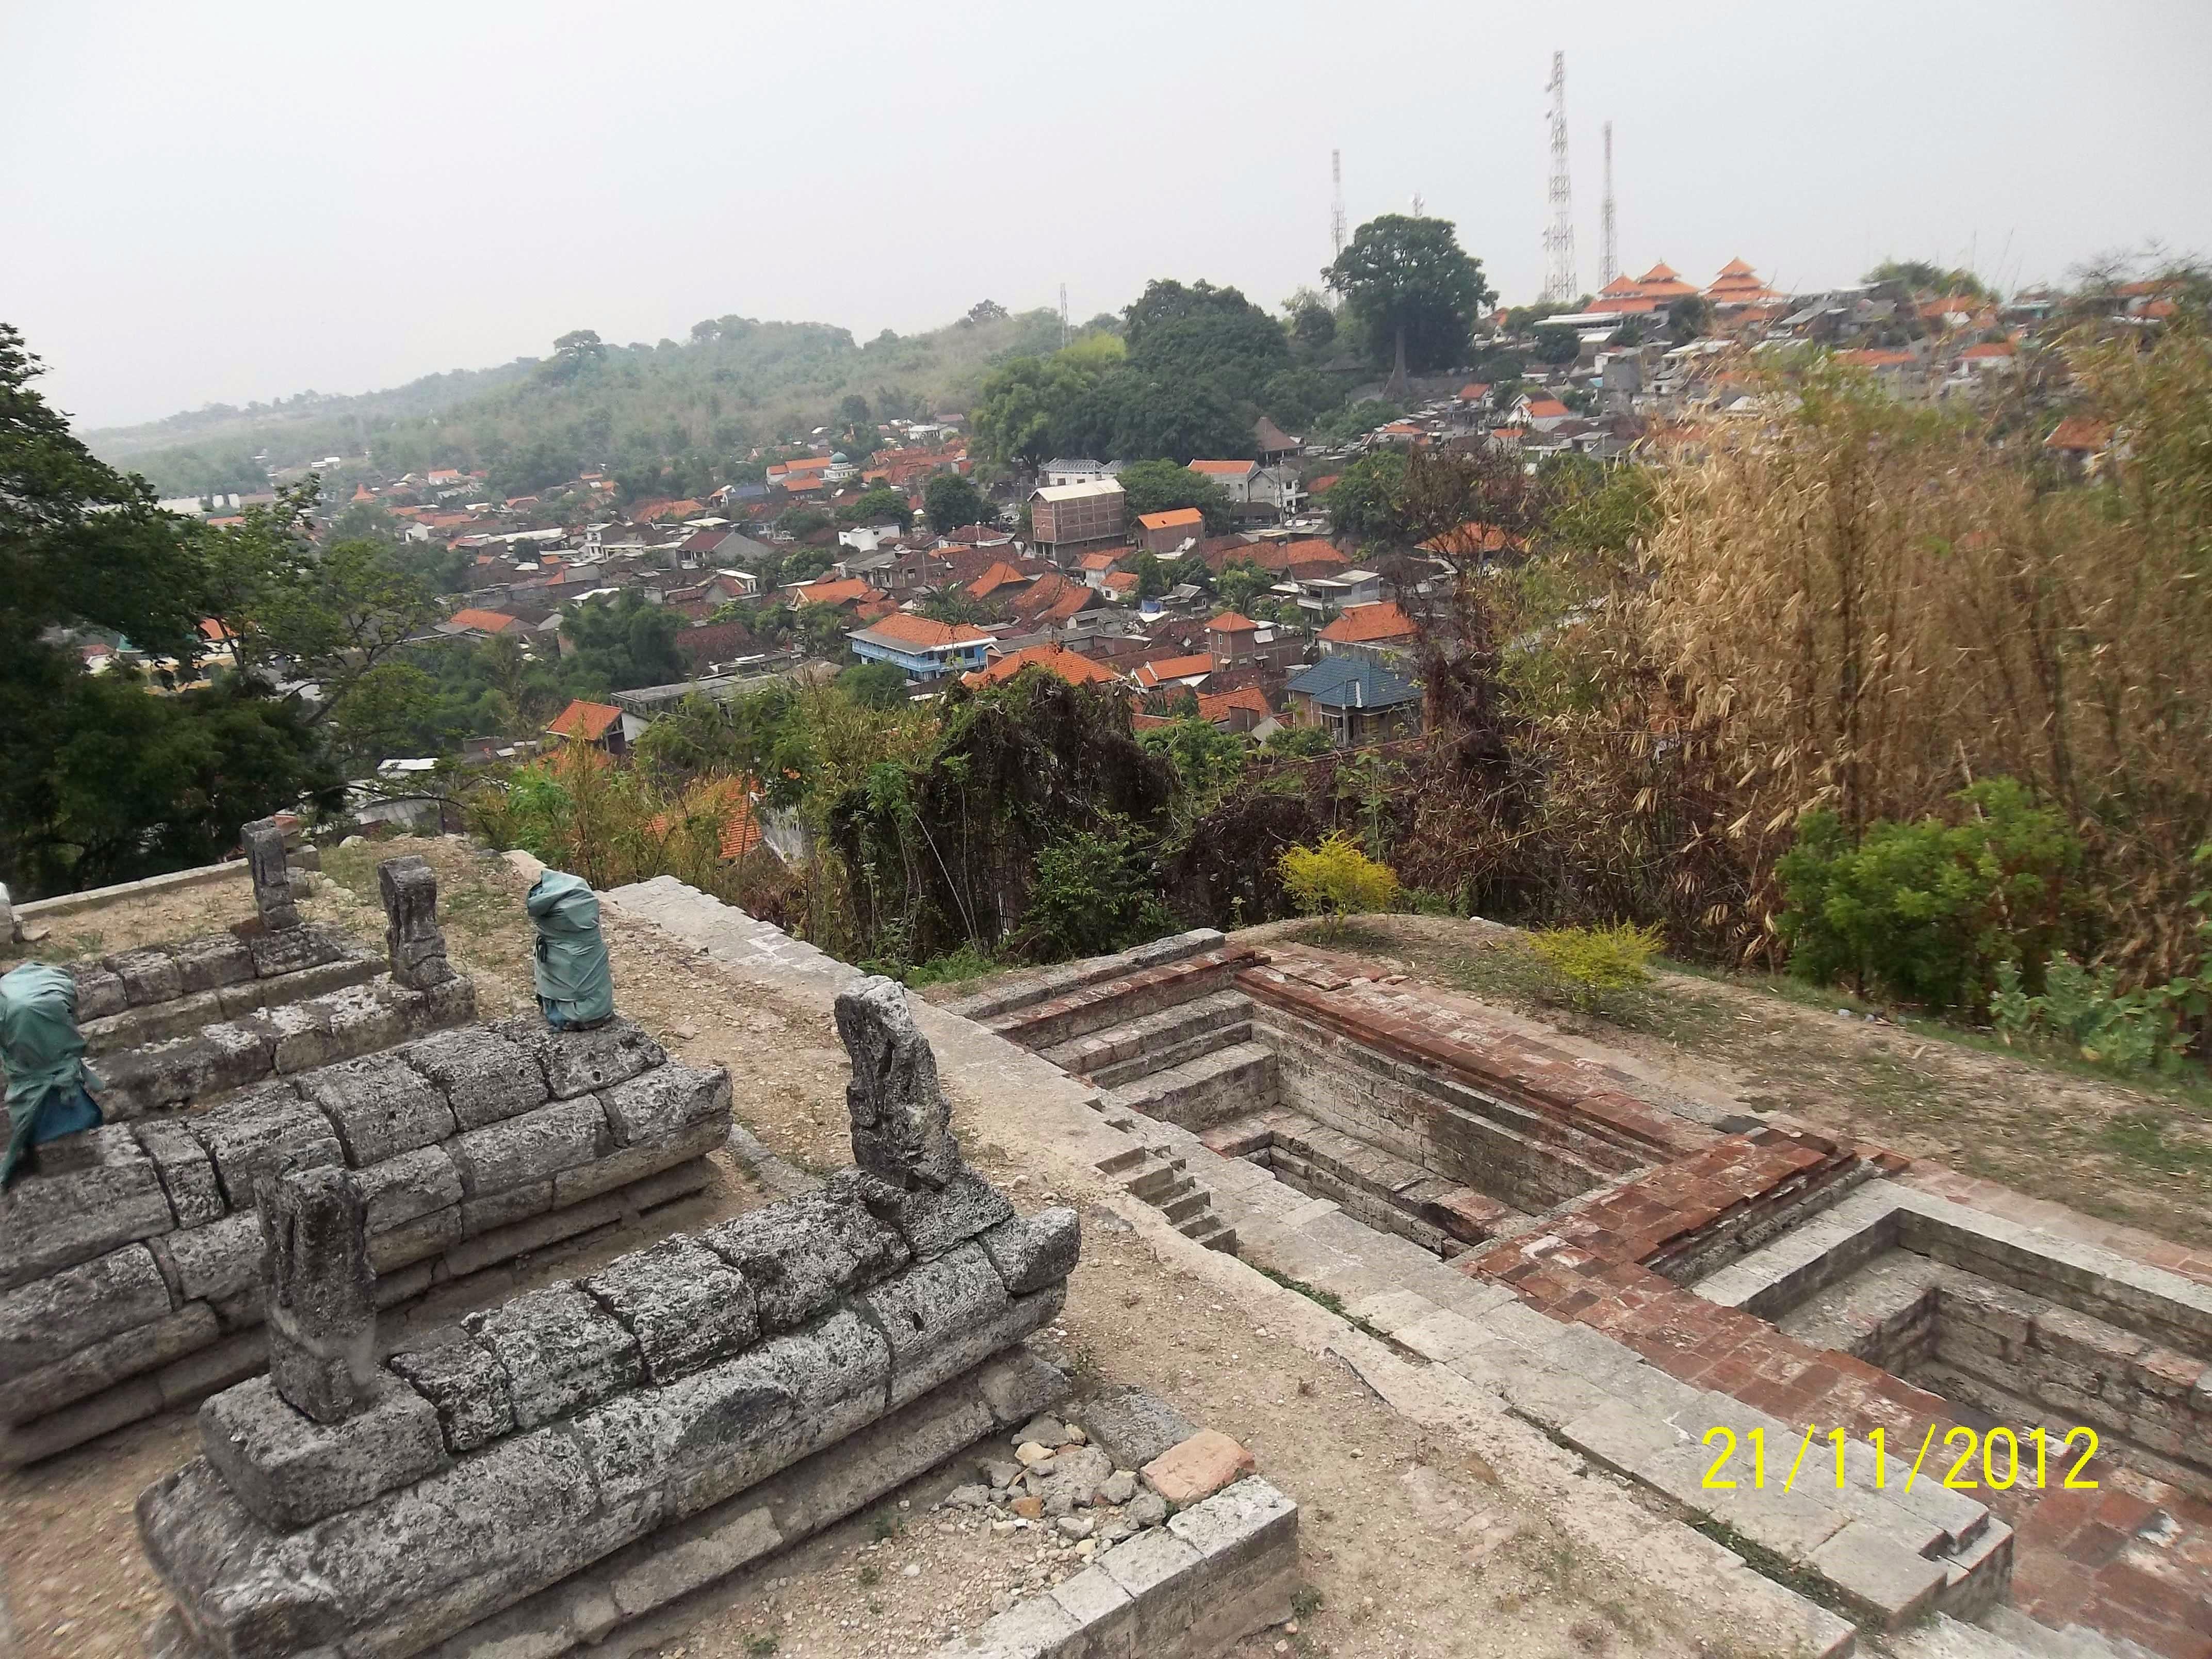 Makam Sunan Giri Gresik Terancam Longsor Akibat Pemukiman Padat Kedaton